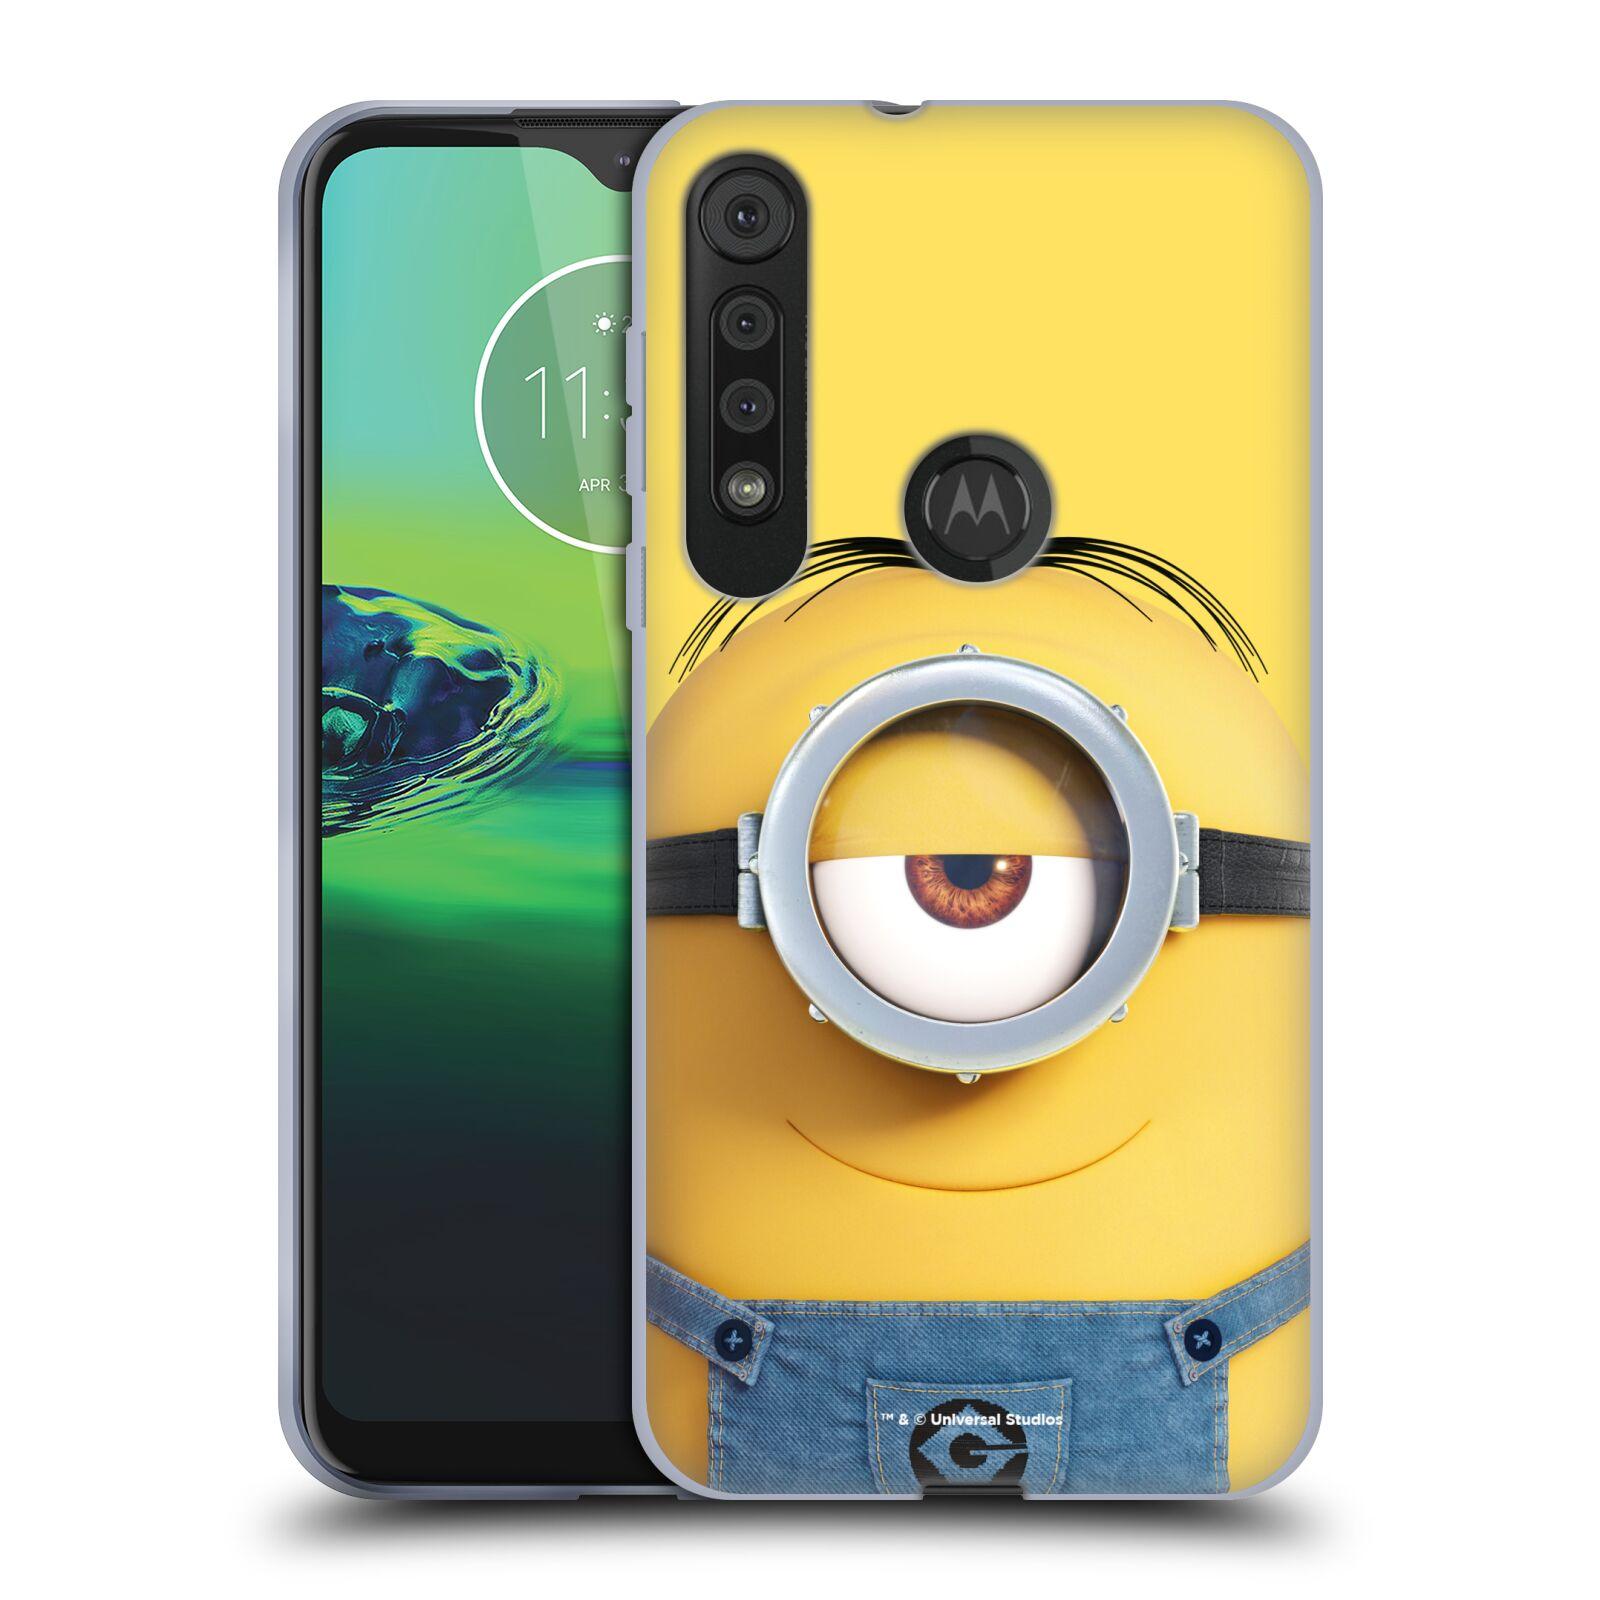 Silikonové pouzdro na mobil Motorola One Macro - Head Case - Mimoň Stuart z filmu Já, padouch - Despicable Me